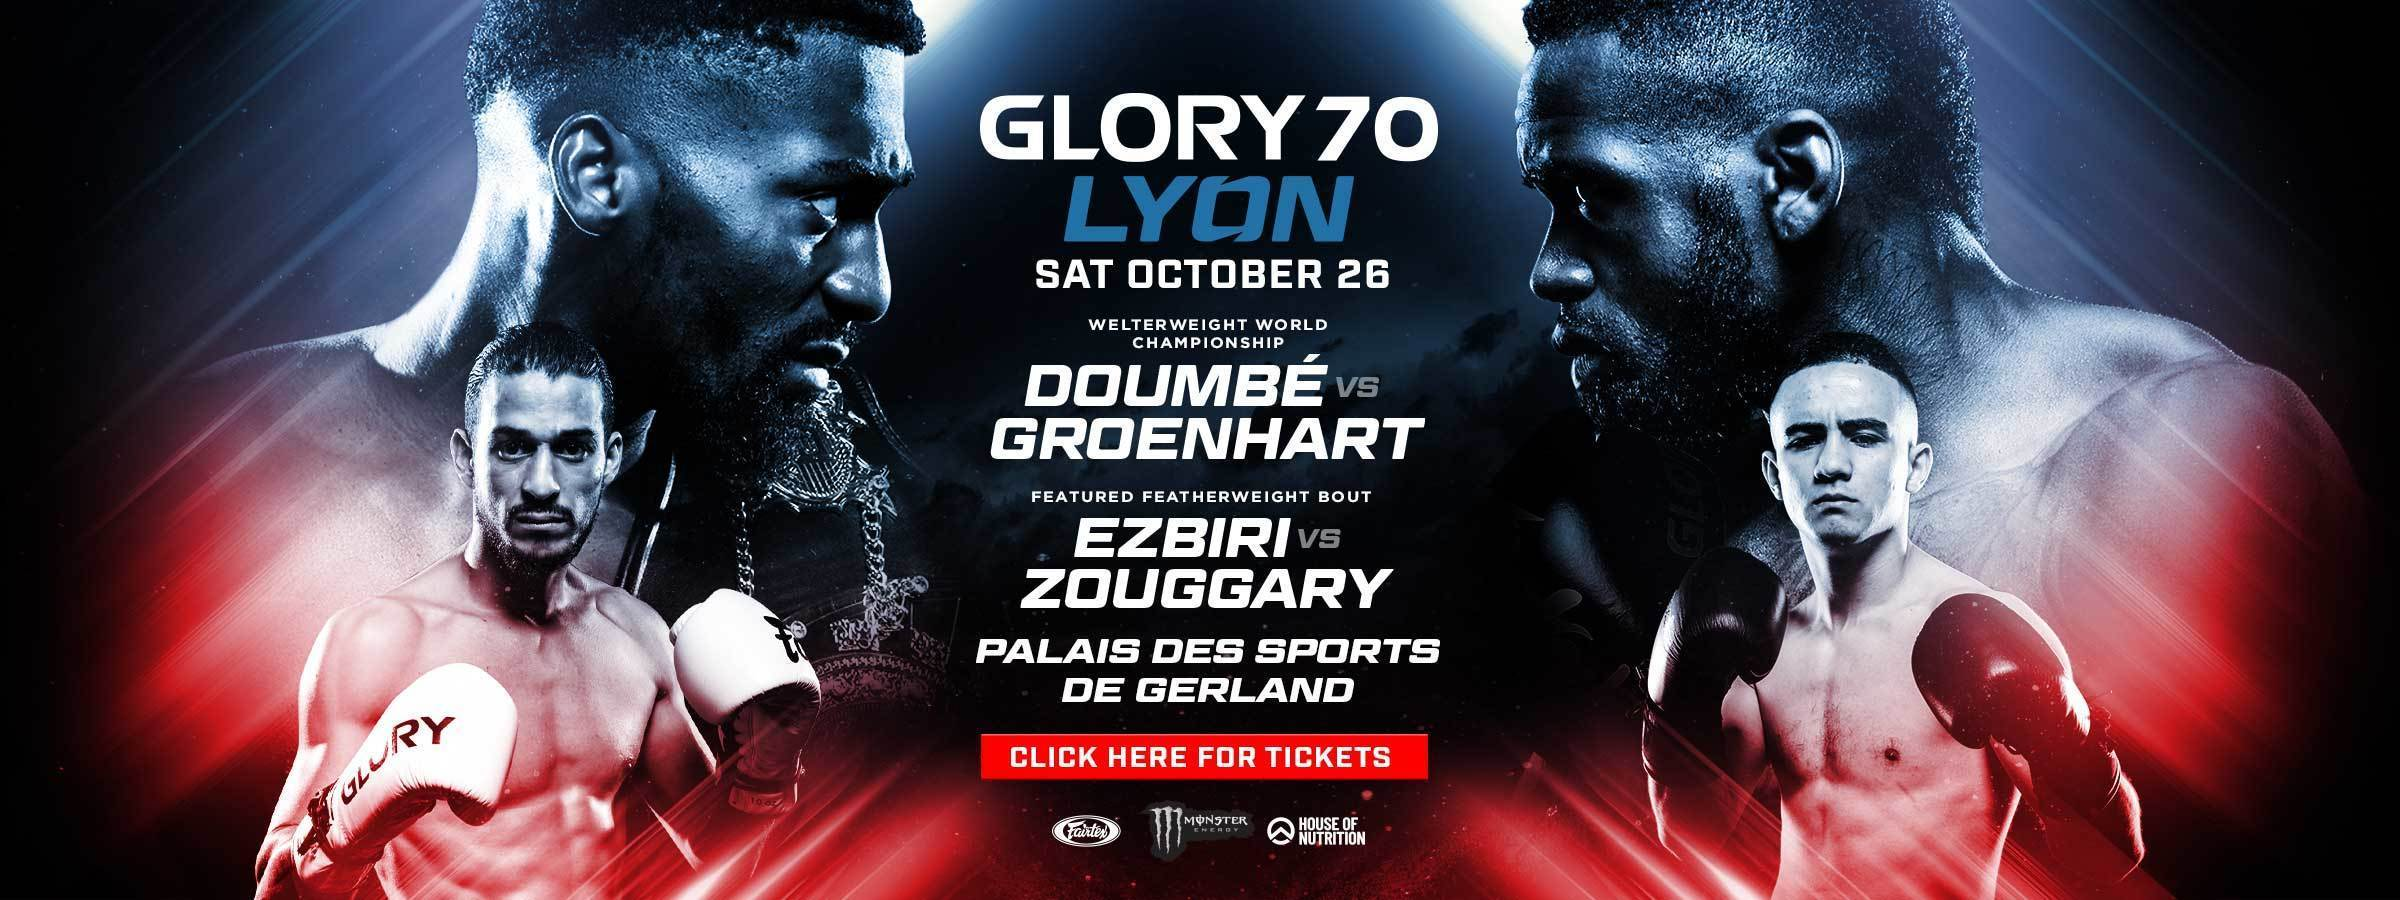 GLORY 70 Lyon